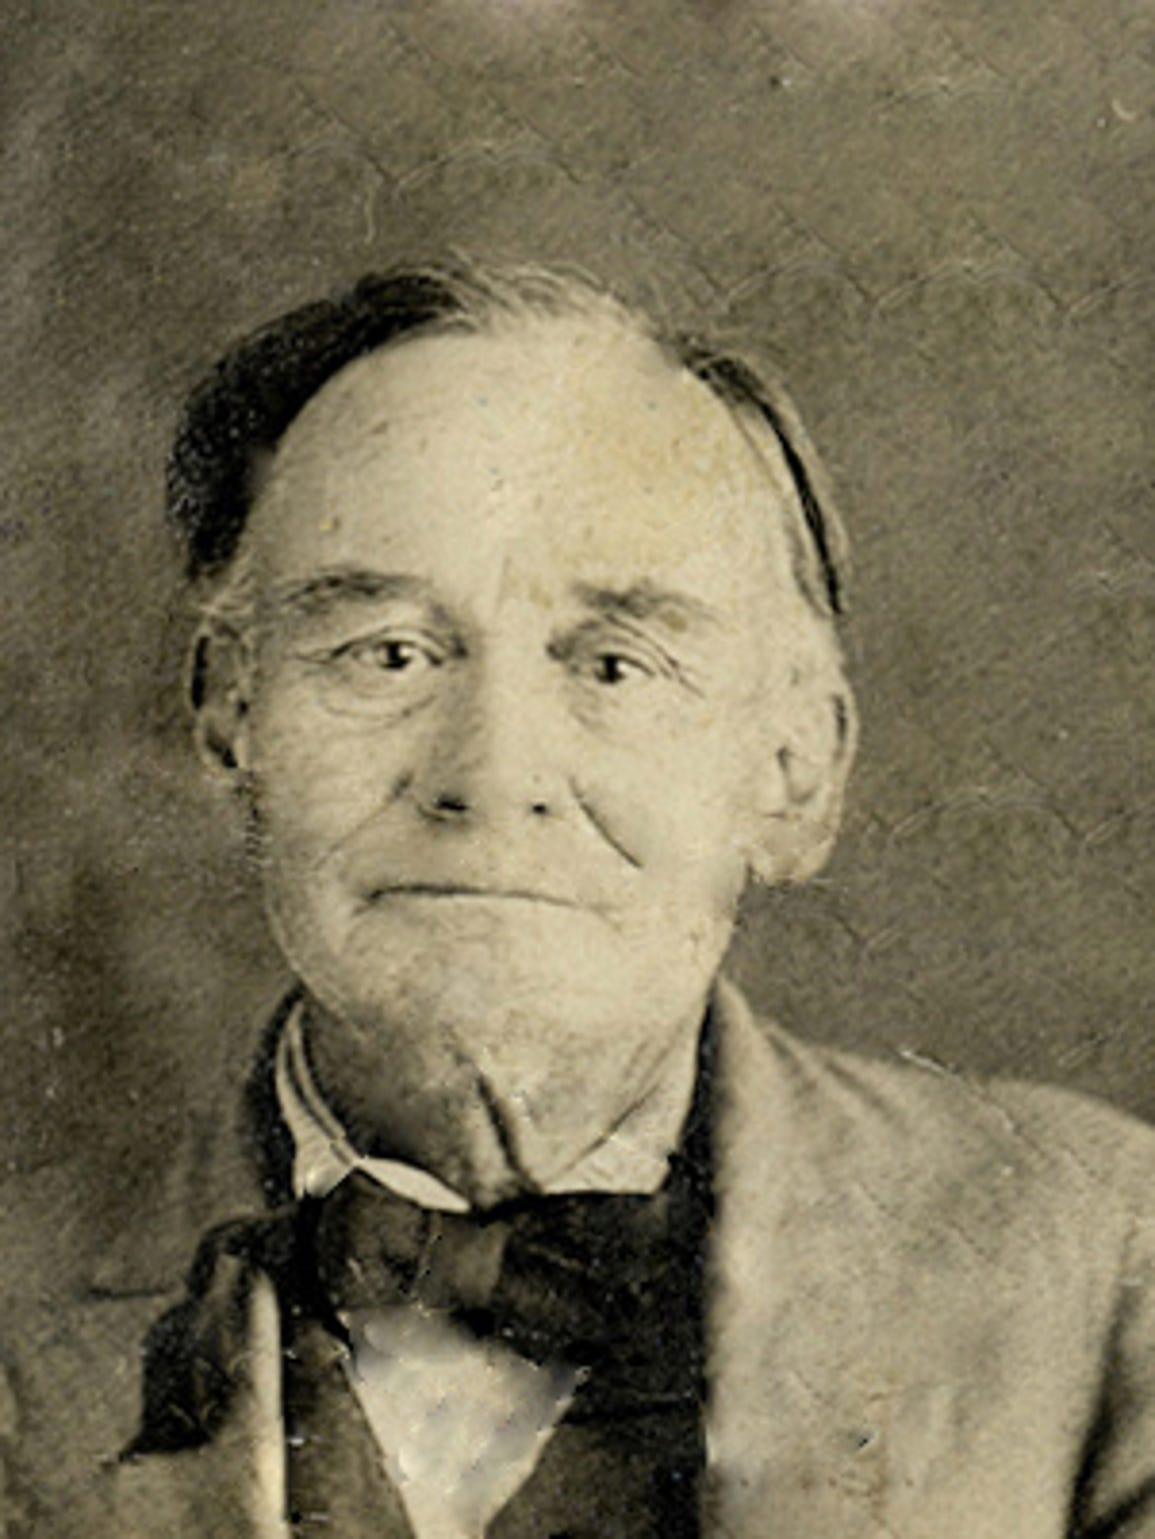 Harry Warren, a schoolmaster who lived near Porvenir,